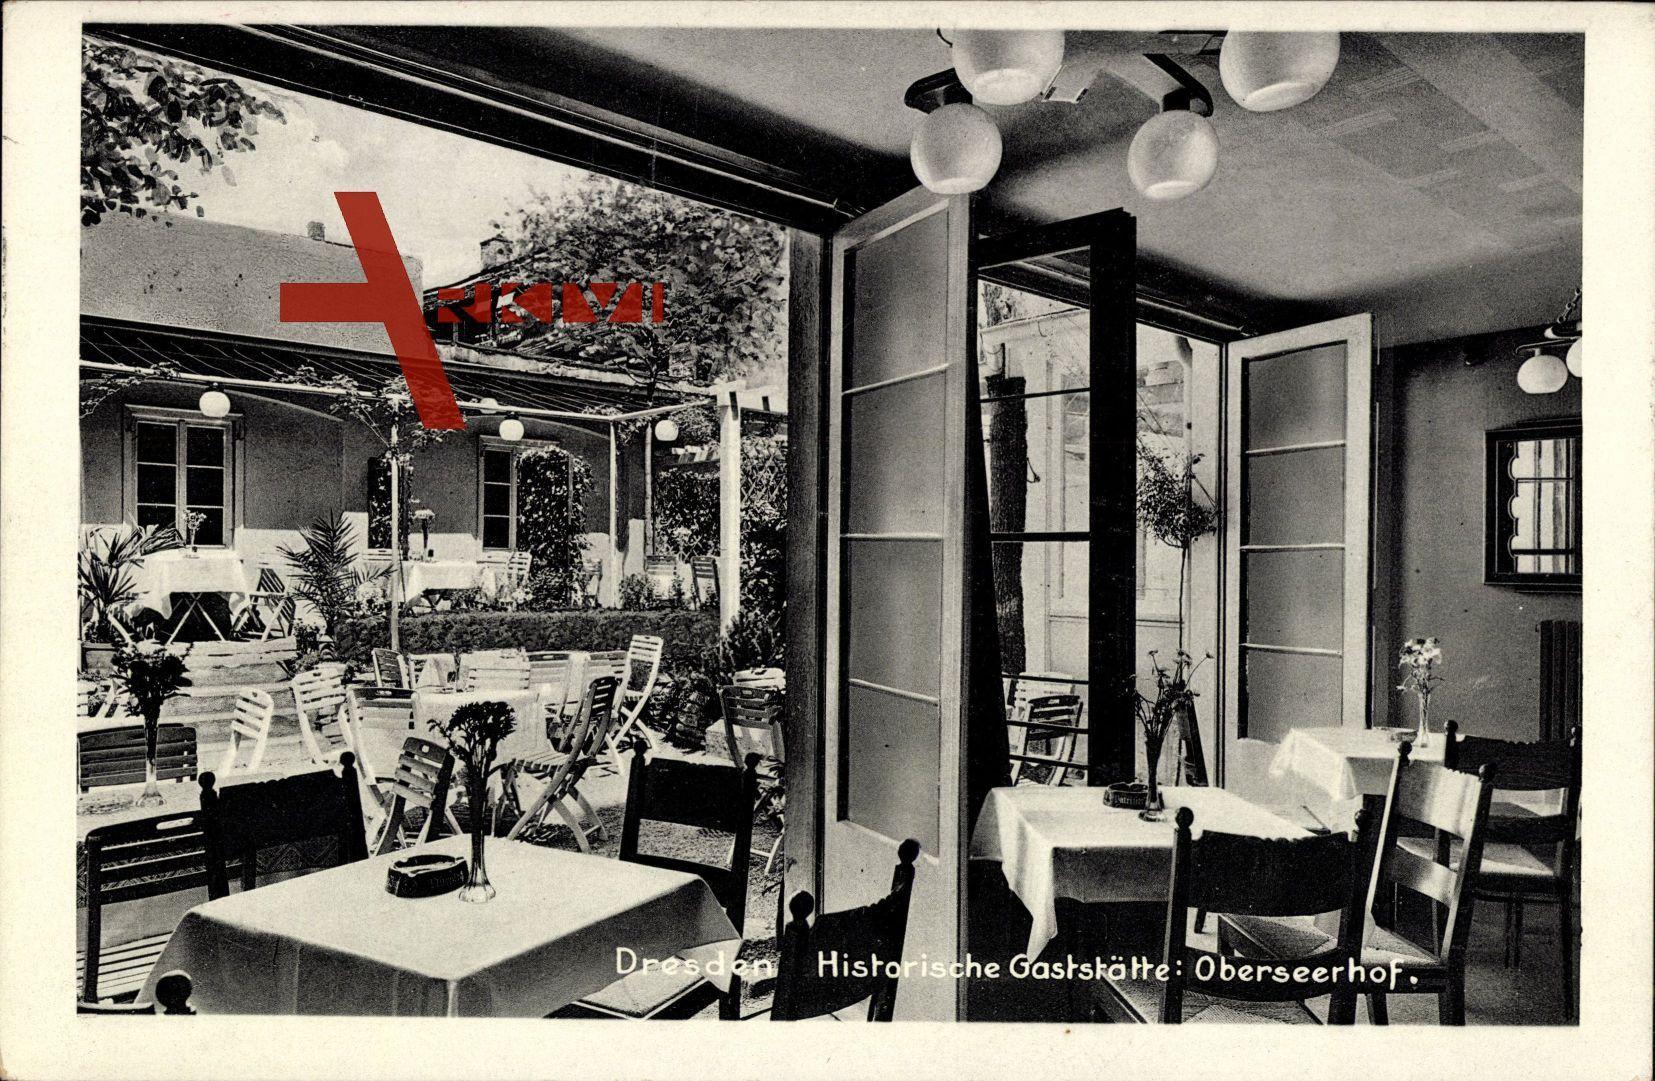 dresden historische gastst tte oberseerhof willy exner xl. Black Bedroom Furniture Sets. Home Design Ideas